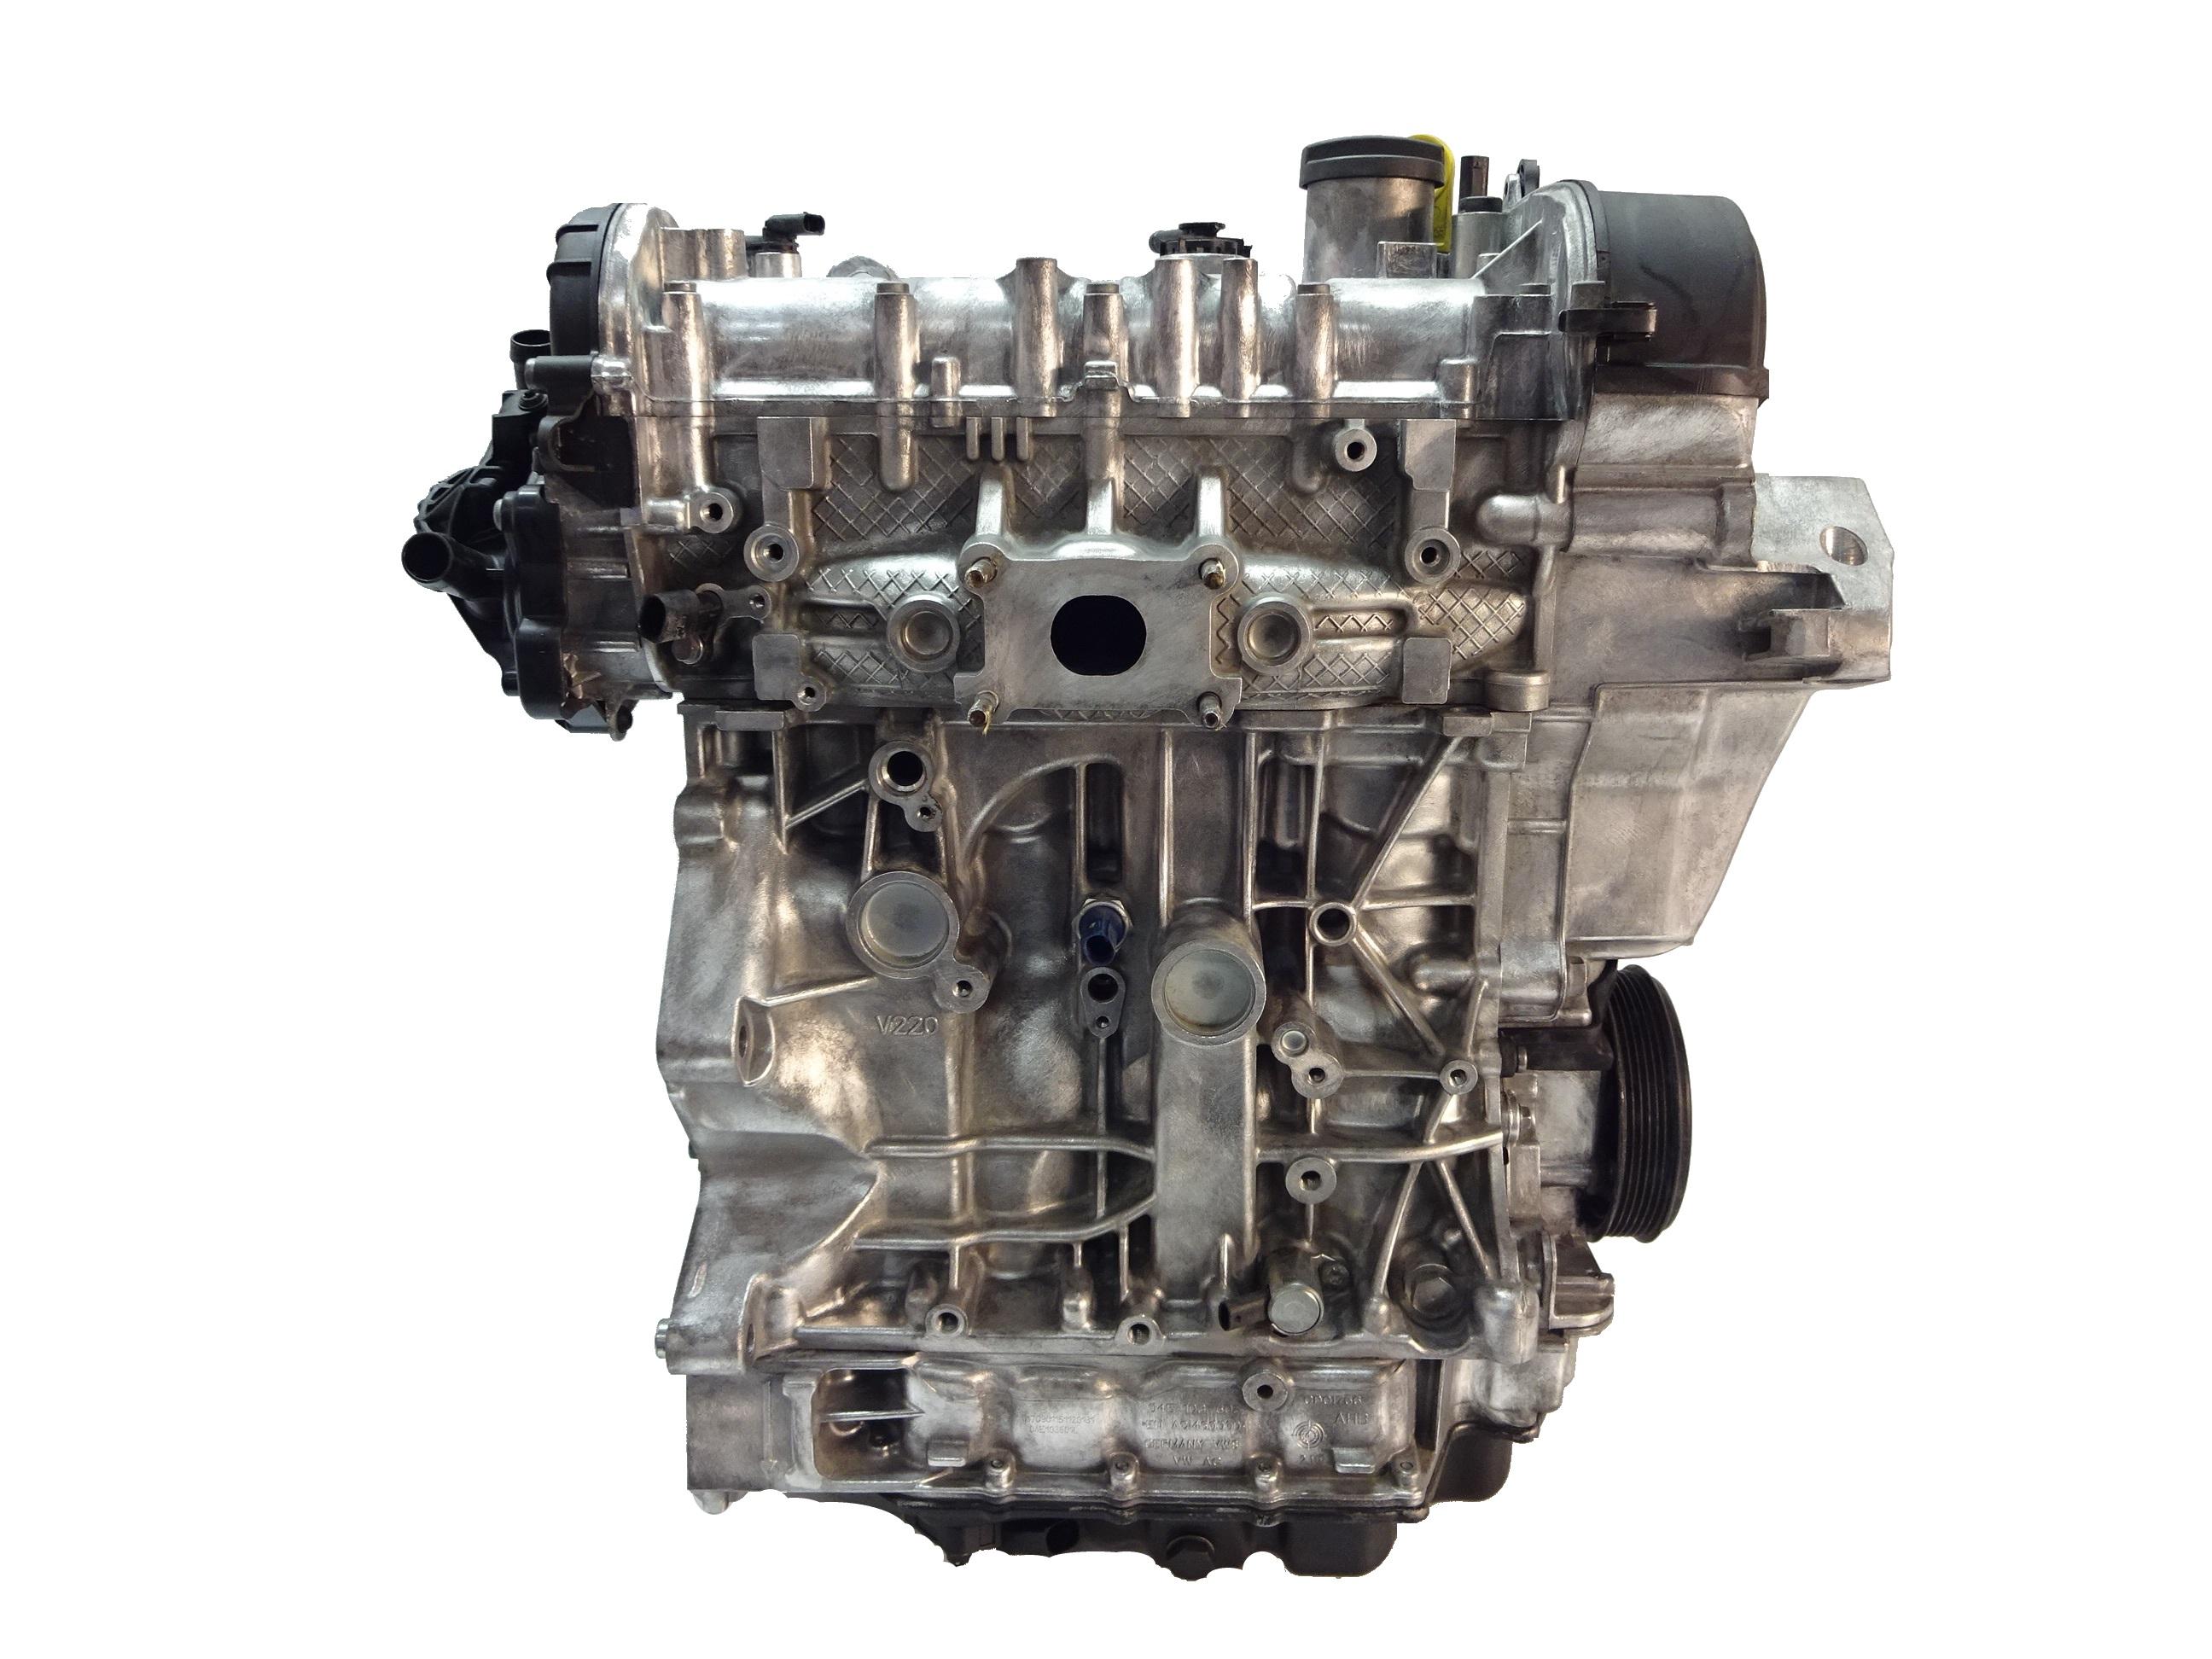 Motor Überholung Instandsetzung Reparatur Audi Seat VW A3 Leon 1,4 TSI TFSI CXS